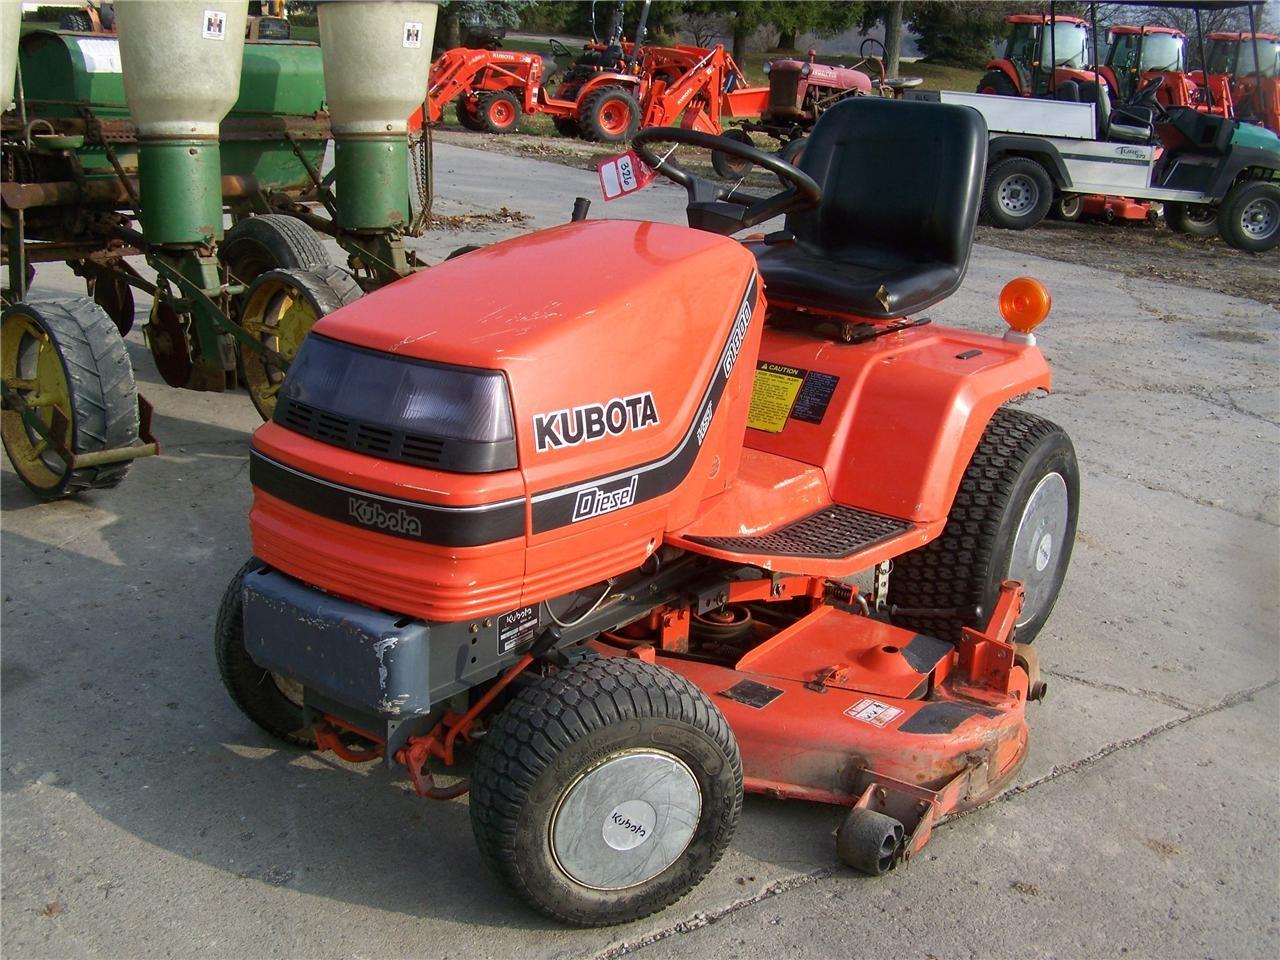 Kubota Lawn Tractors : Wisconsin ag connection kubota g riding lawn mowers